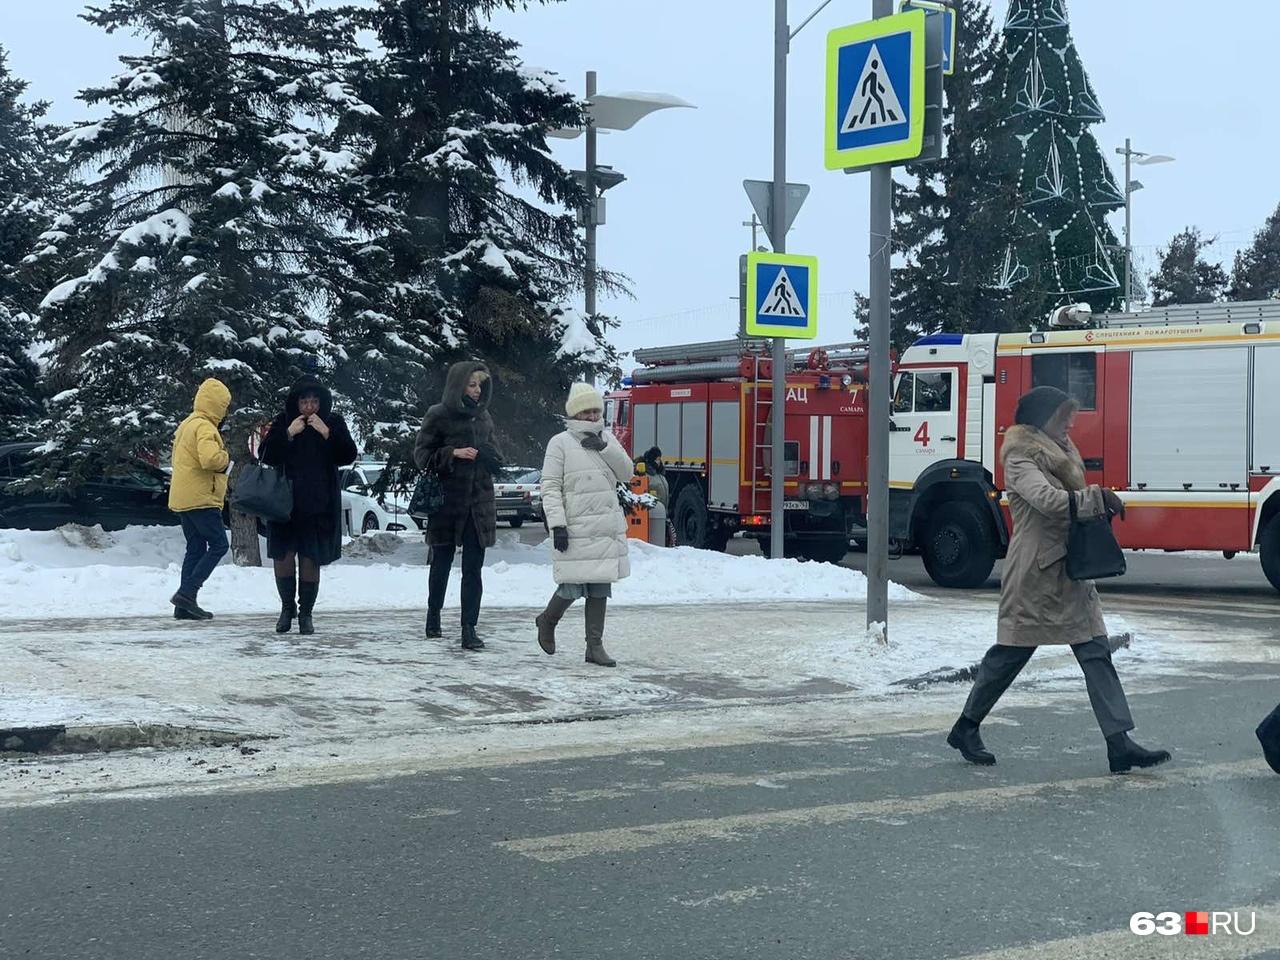 Машины экстренных служб заехали на парковку на площади Славы